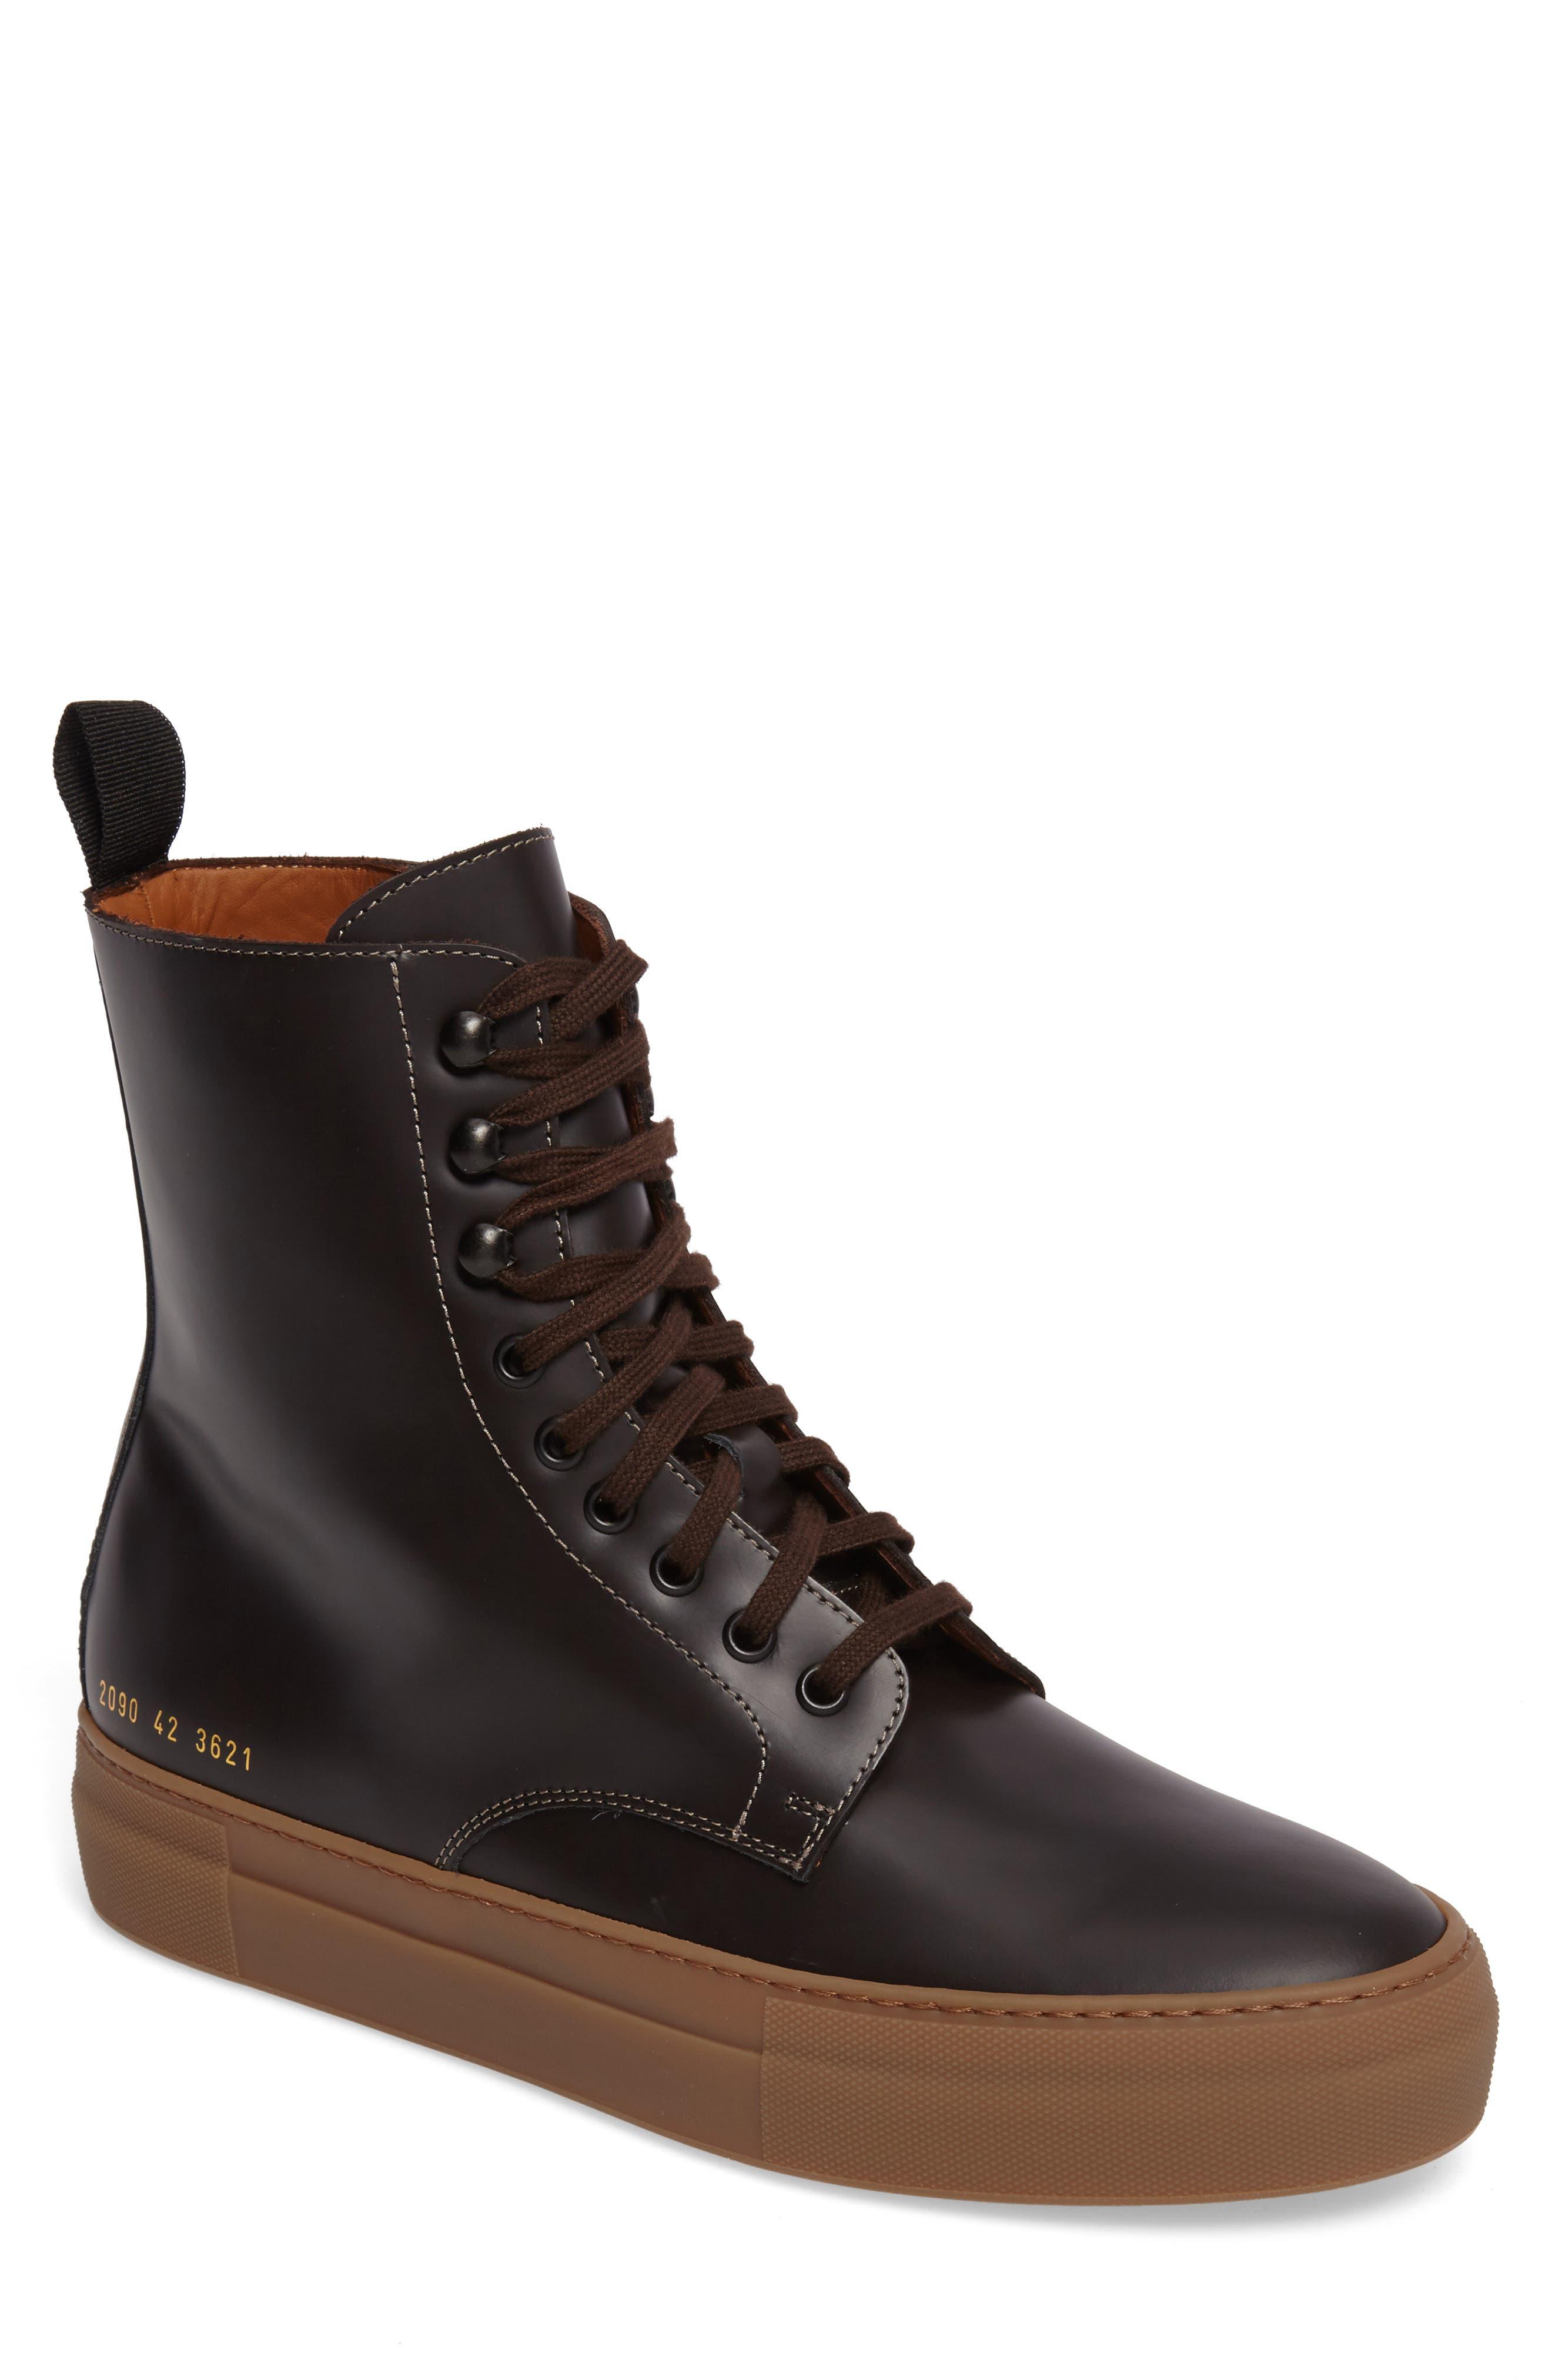 Alternate Image 1 Selected - Common Projects x Robert Geller Plain Toe Boot (Men)